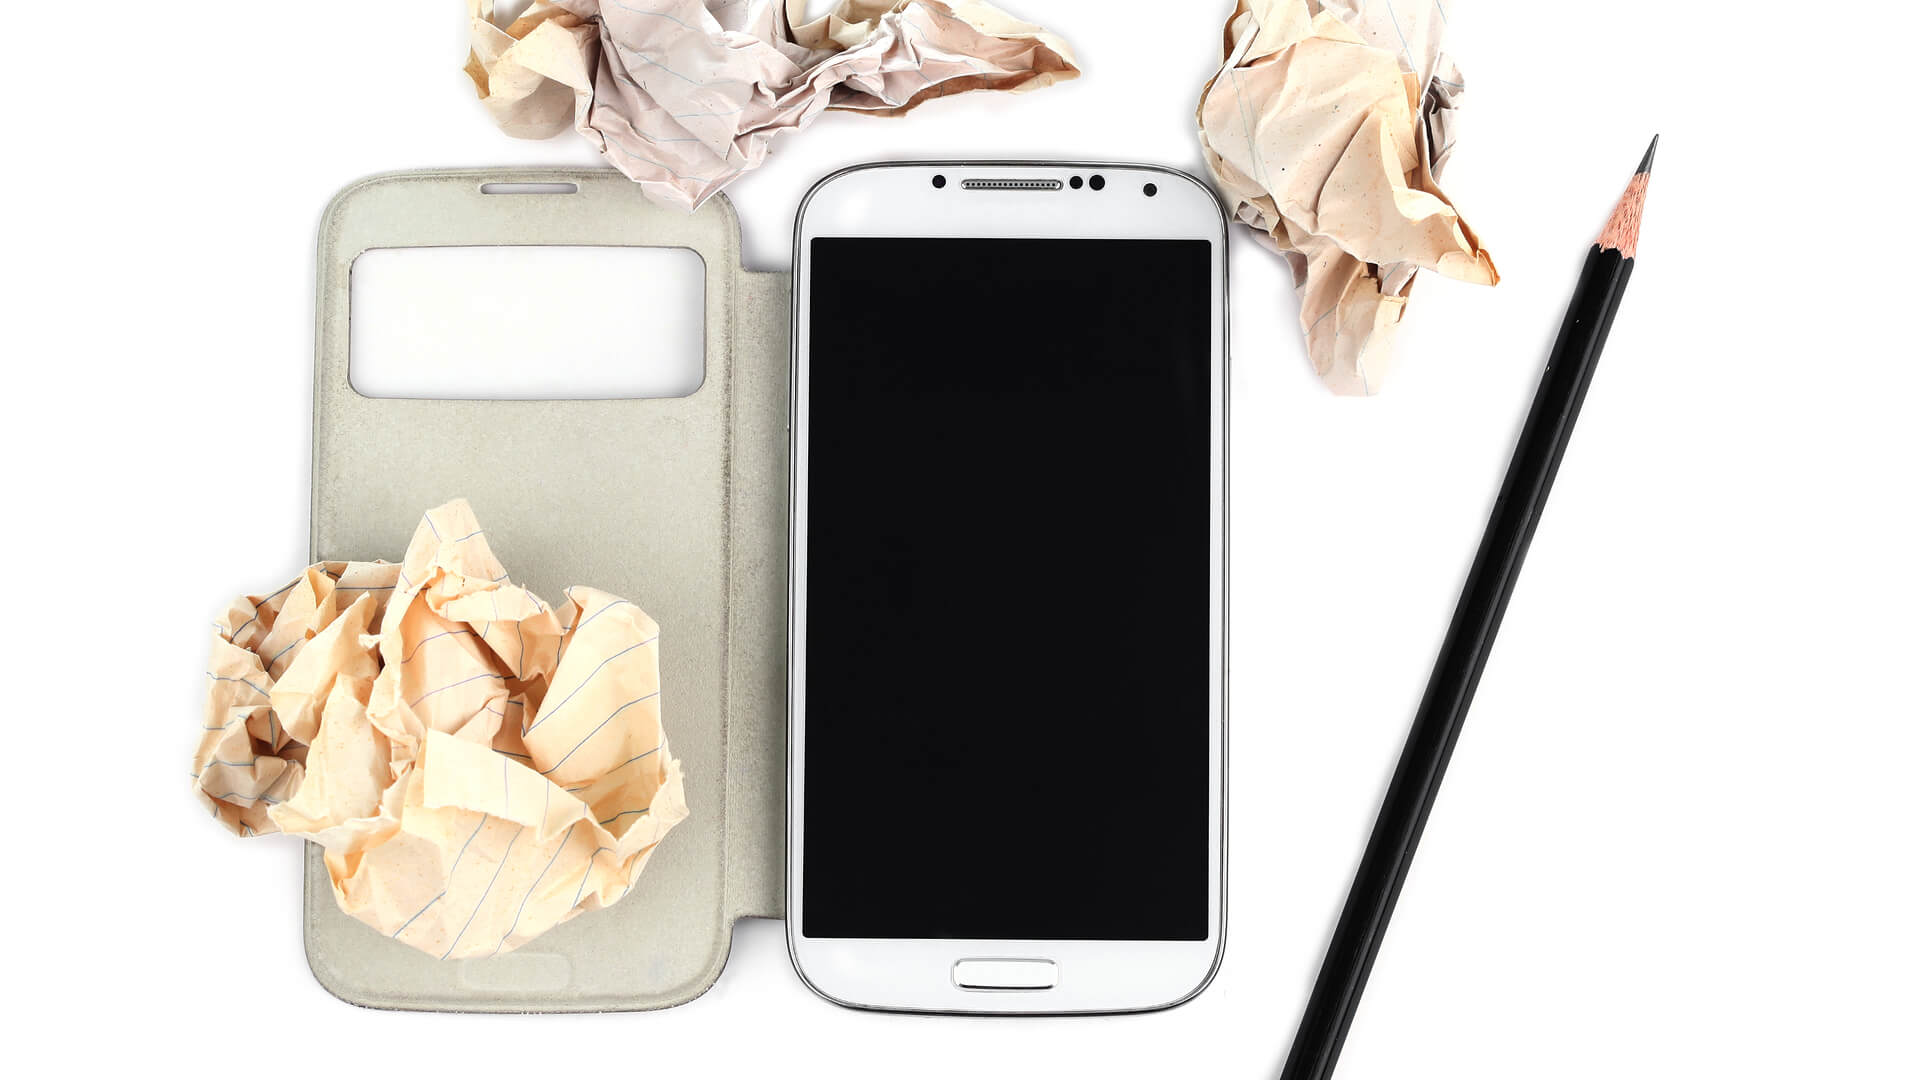 ss-phone-trash-paper